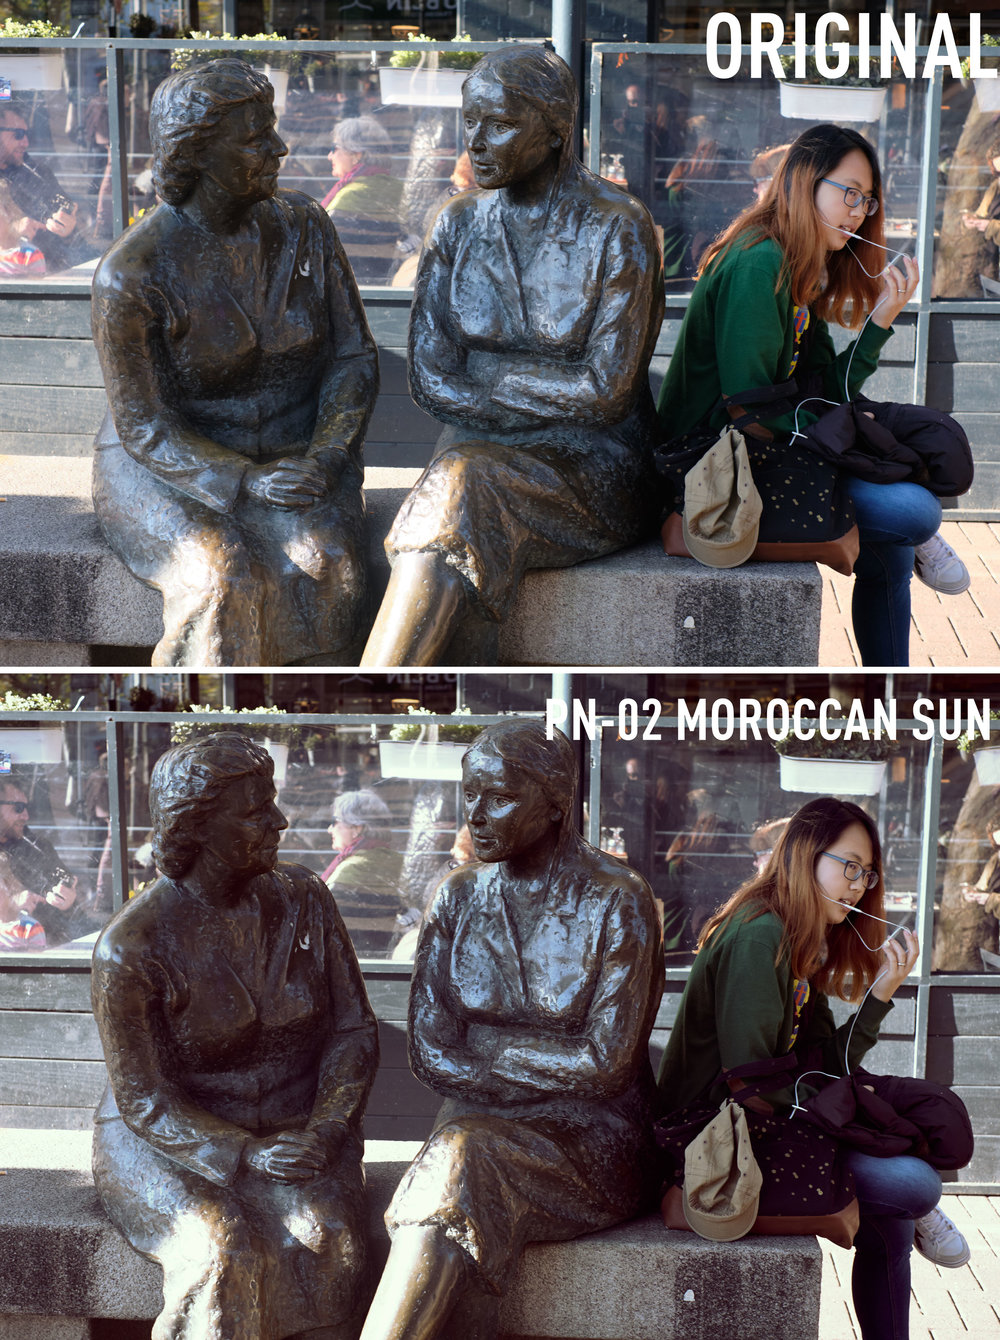 Moroccan-sun.jpg